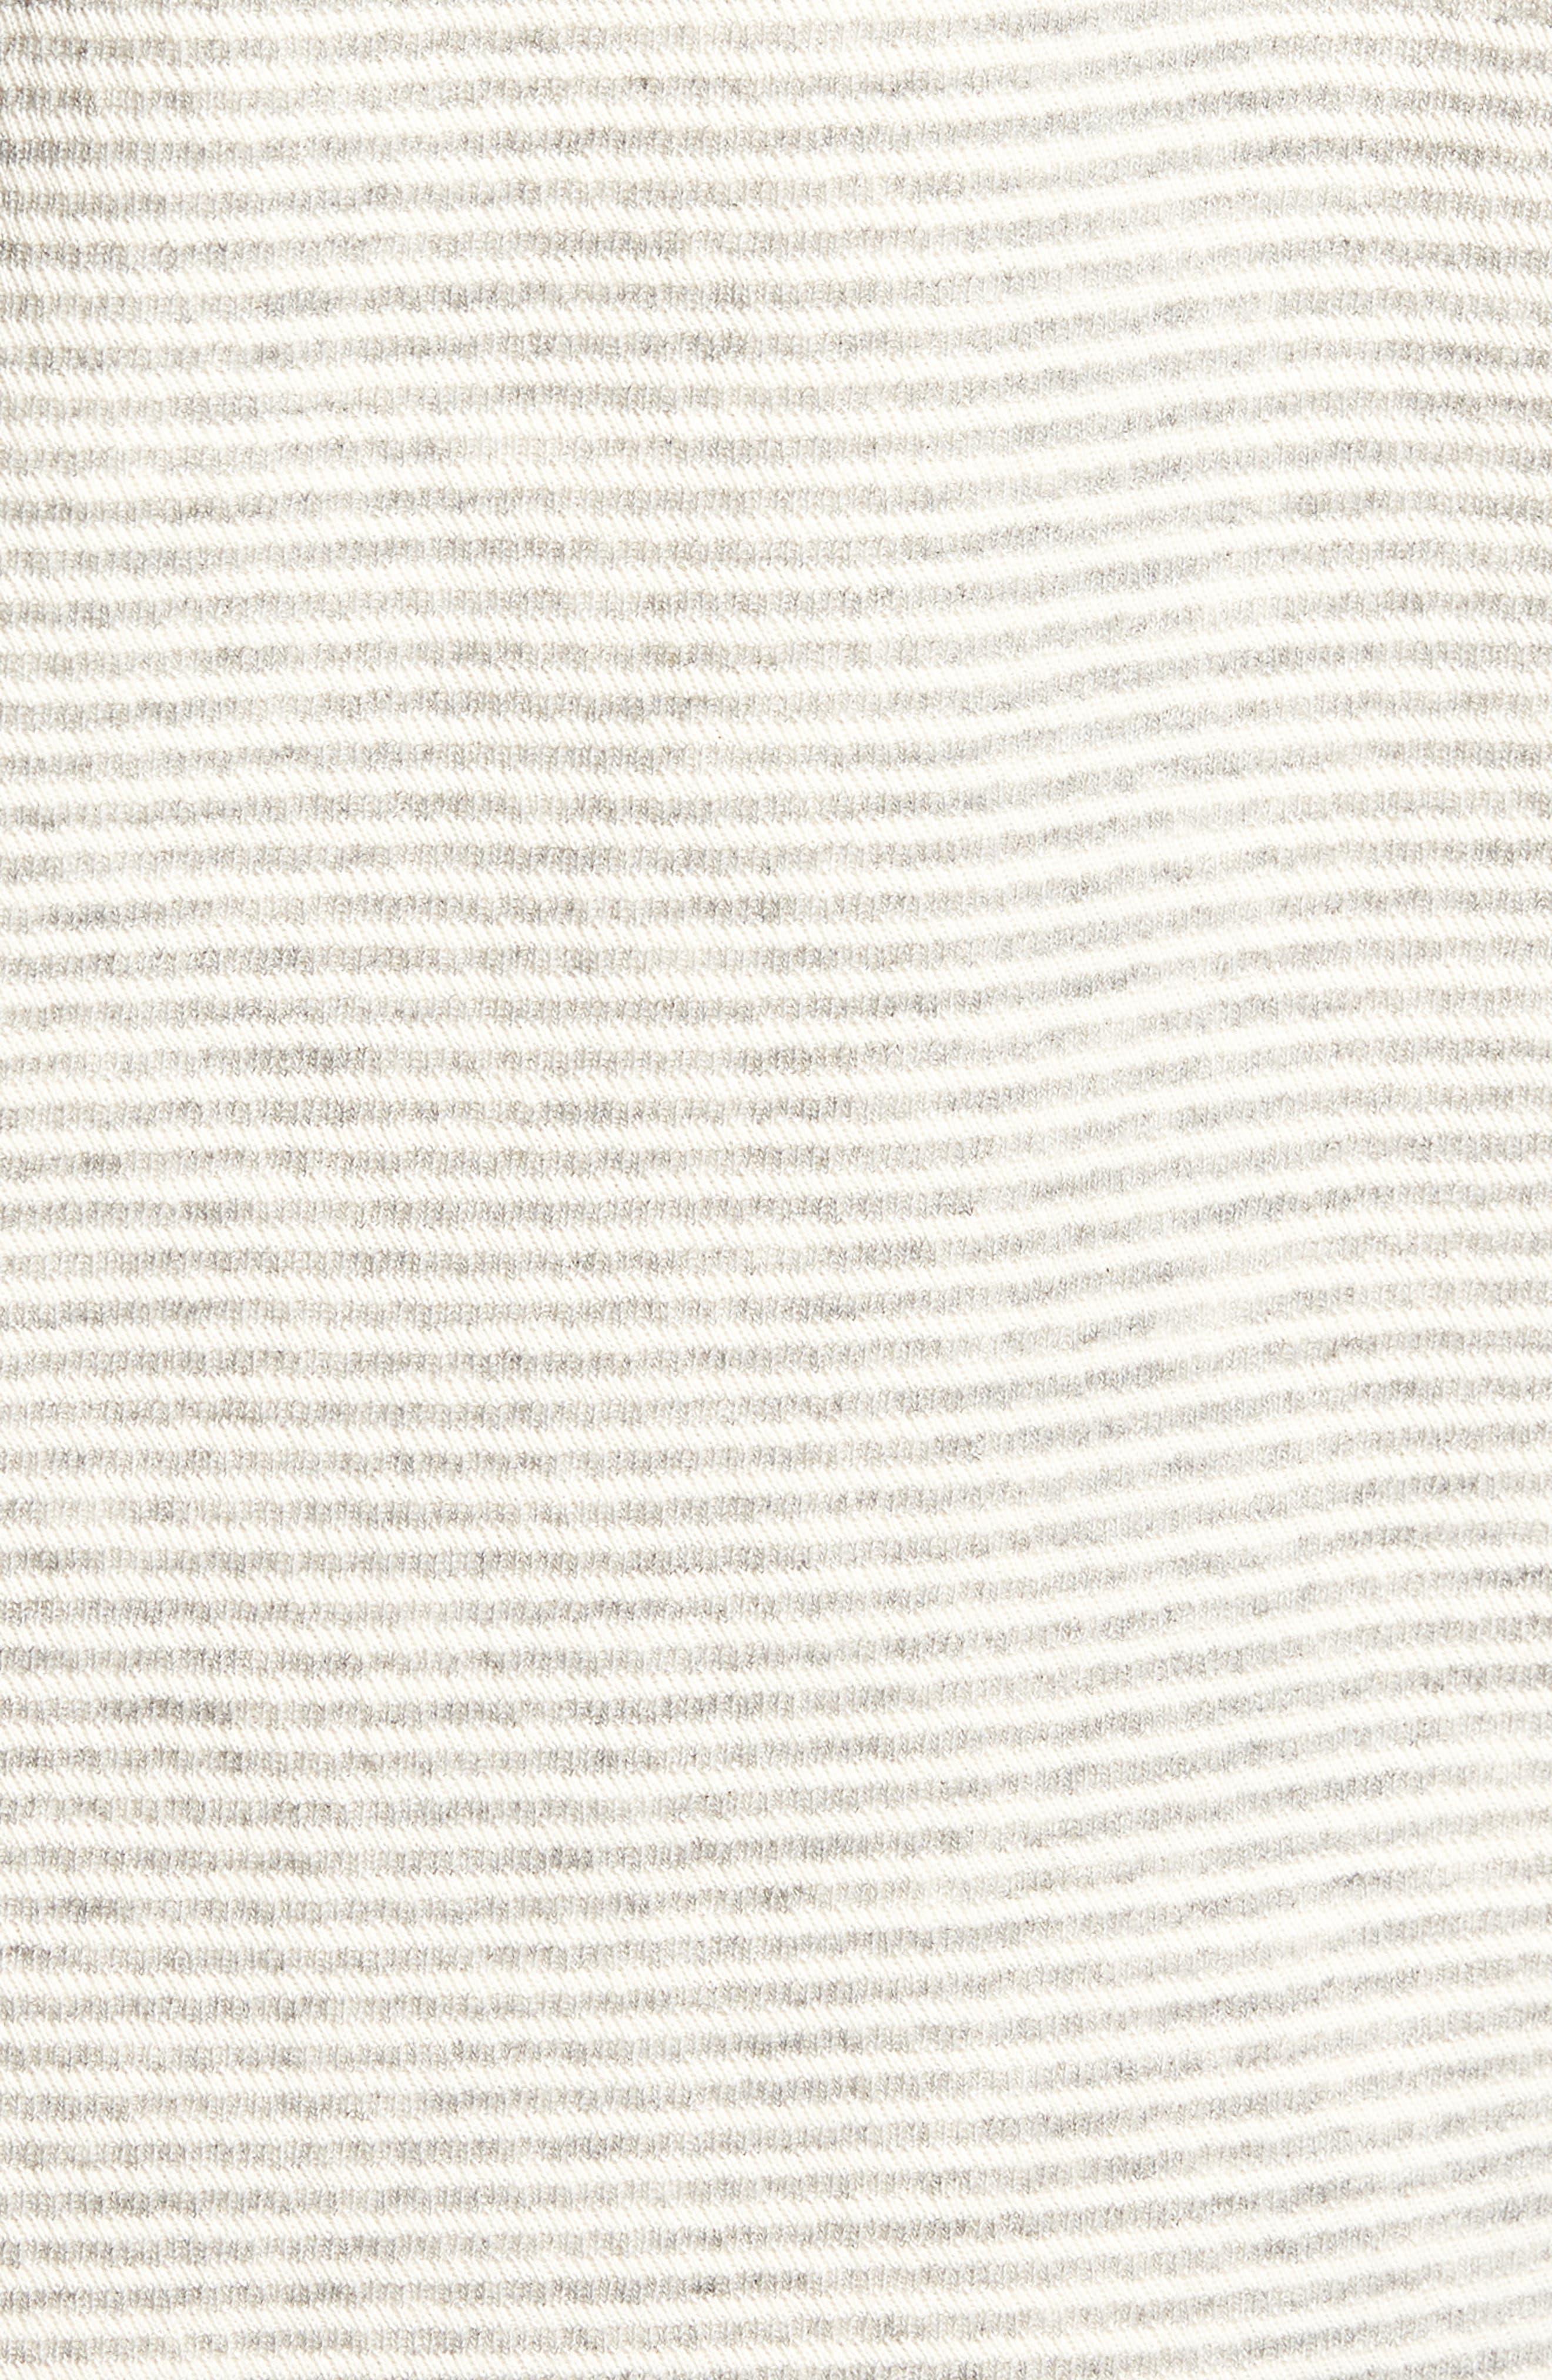 Cotton Blend Hoodie,                             Alternate thumbnail 5, color,                             Grey/ Natural